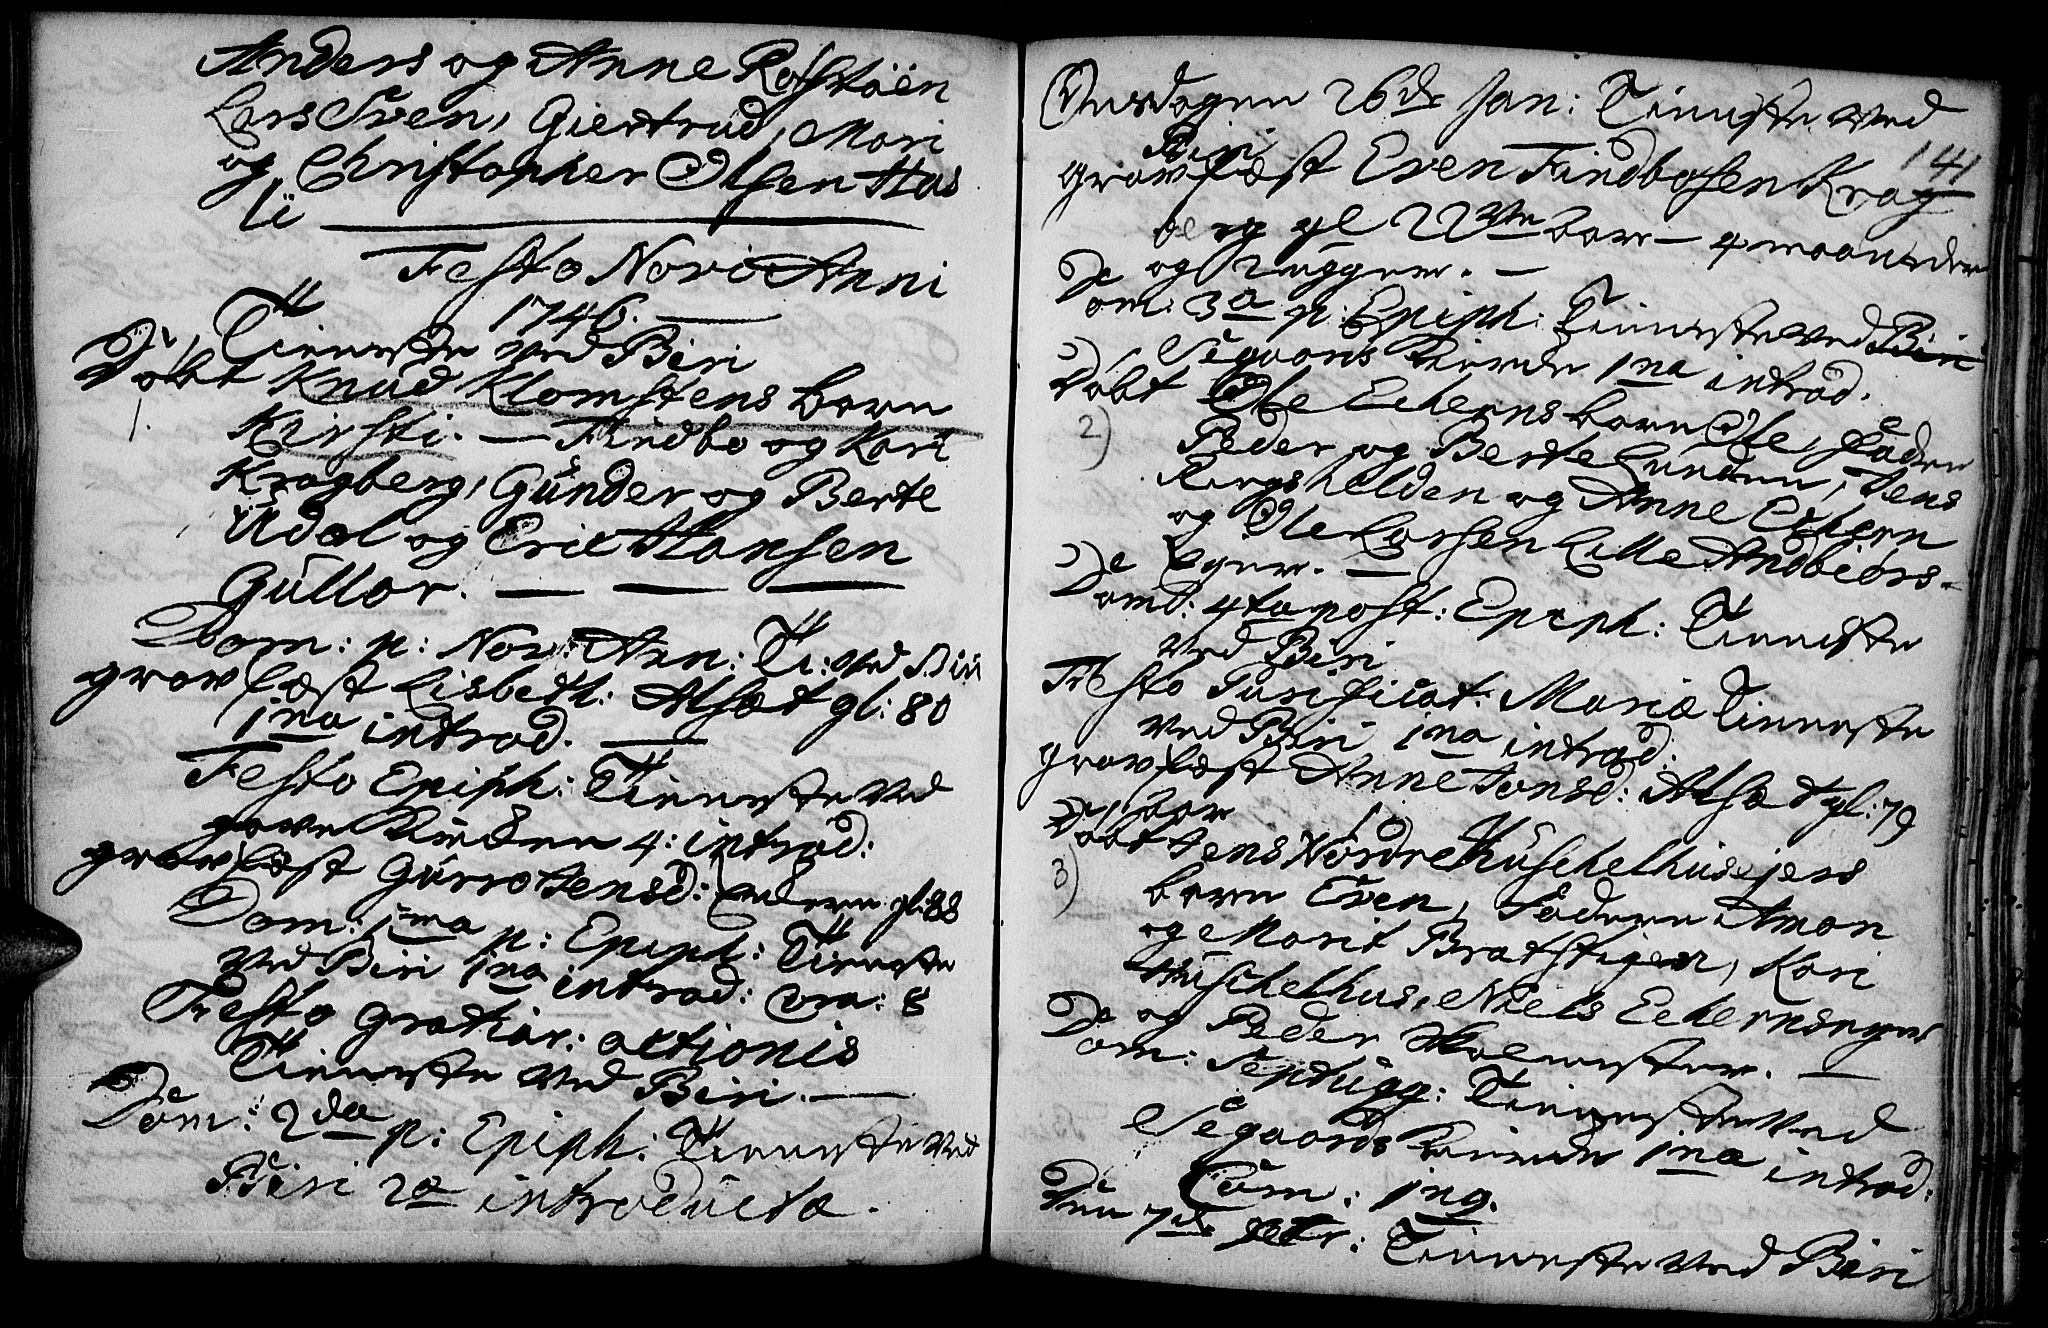 SAH, Biri prestekontor, Ministerialbok nr. 1, 1730-1754, s. 141